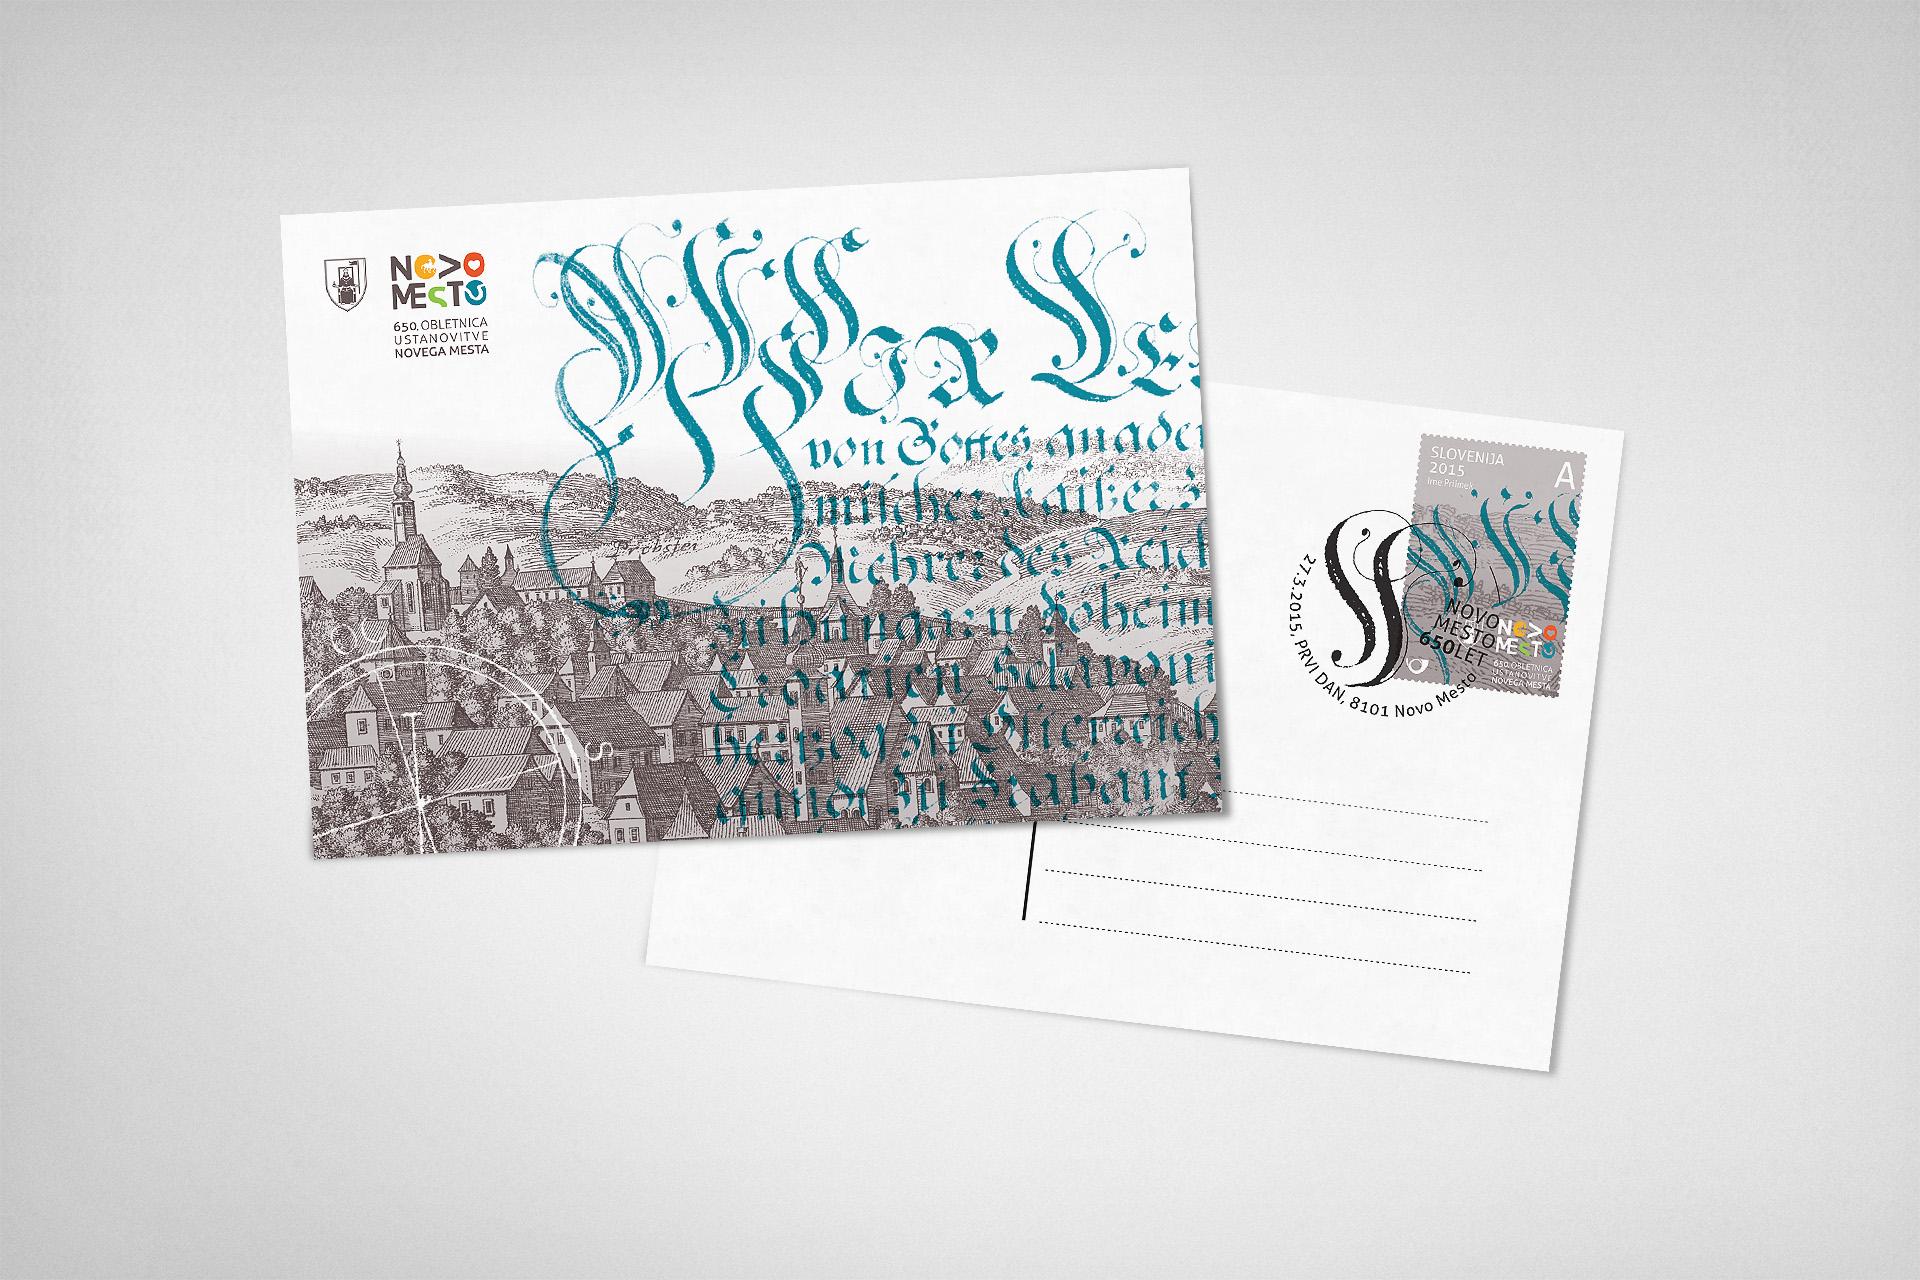 arnoldvuga-novo-mesto-razglednica-jure-kozuh